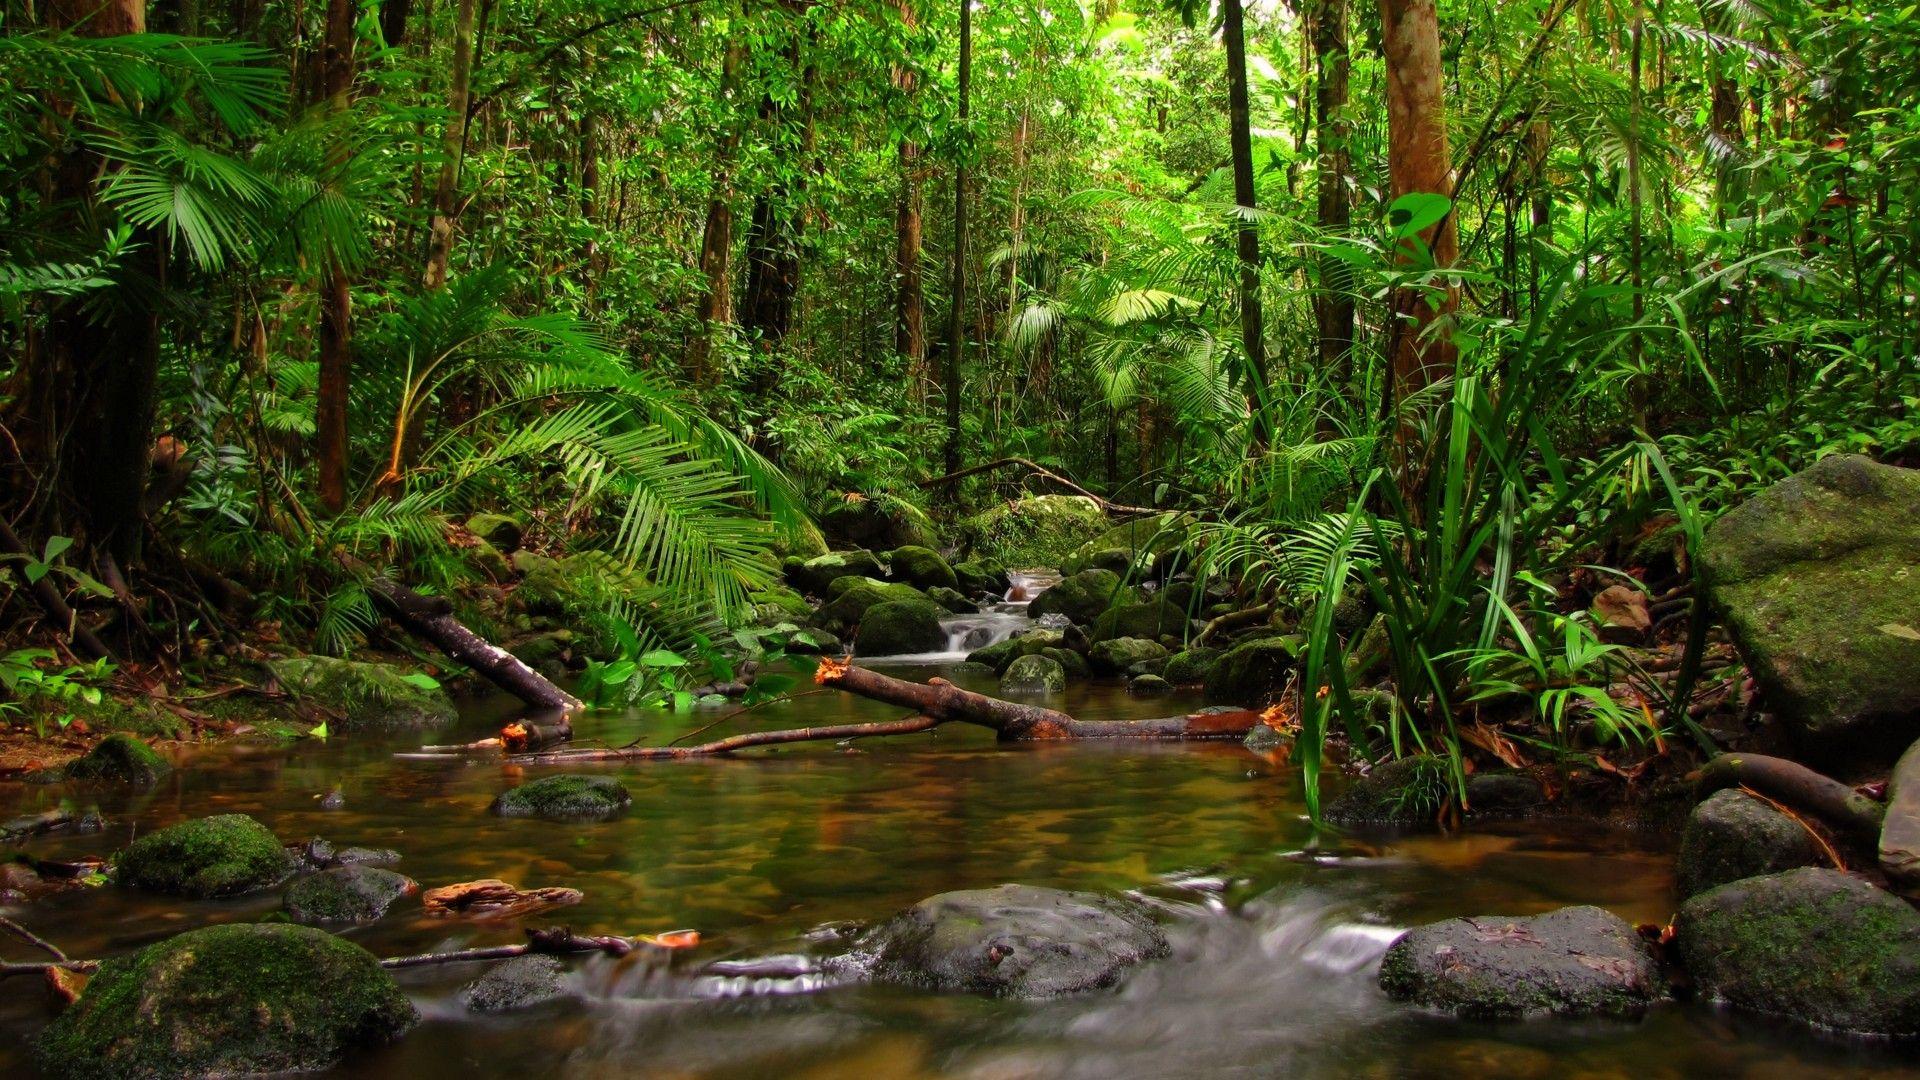 forest river wallpaper hd 962 Jungle wallpaper